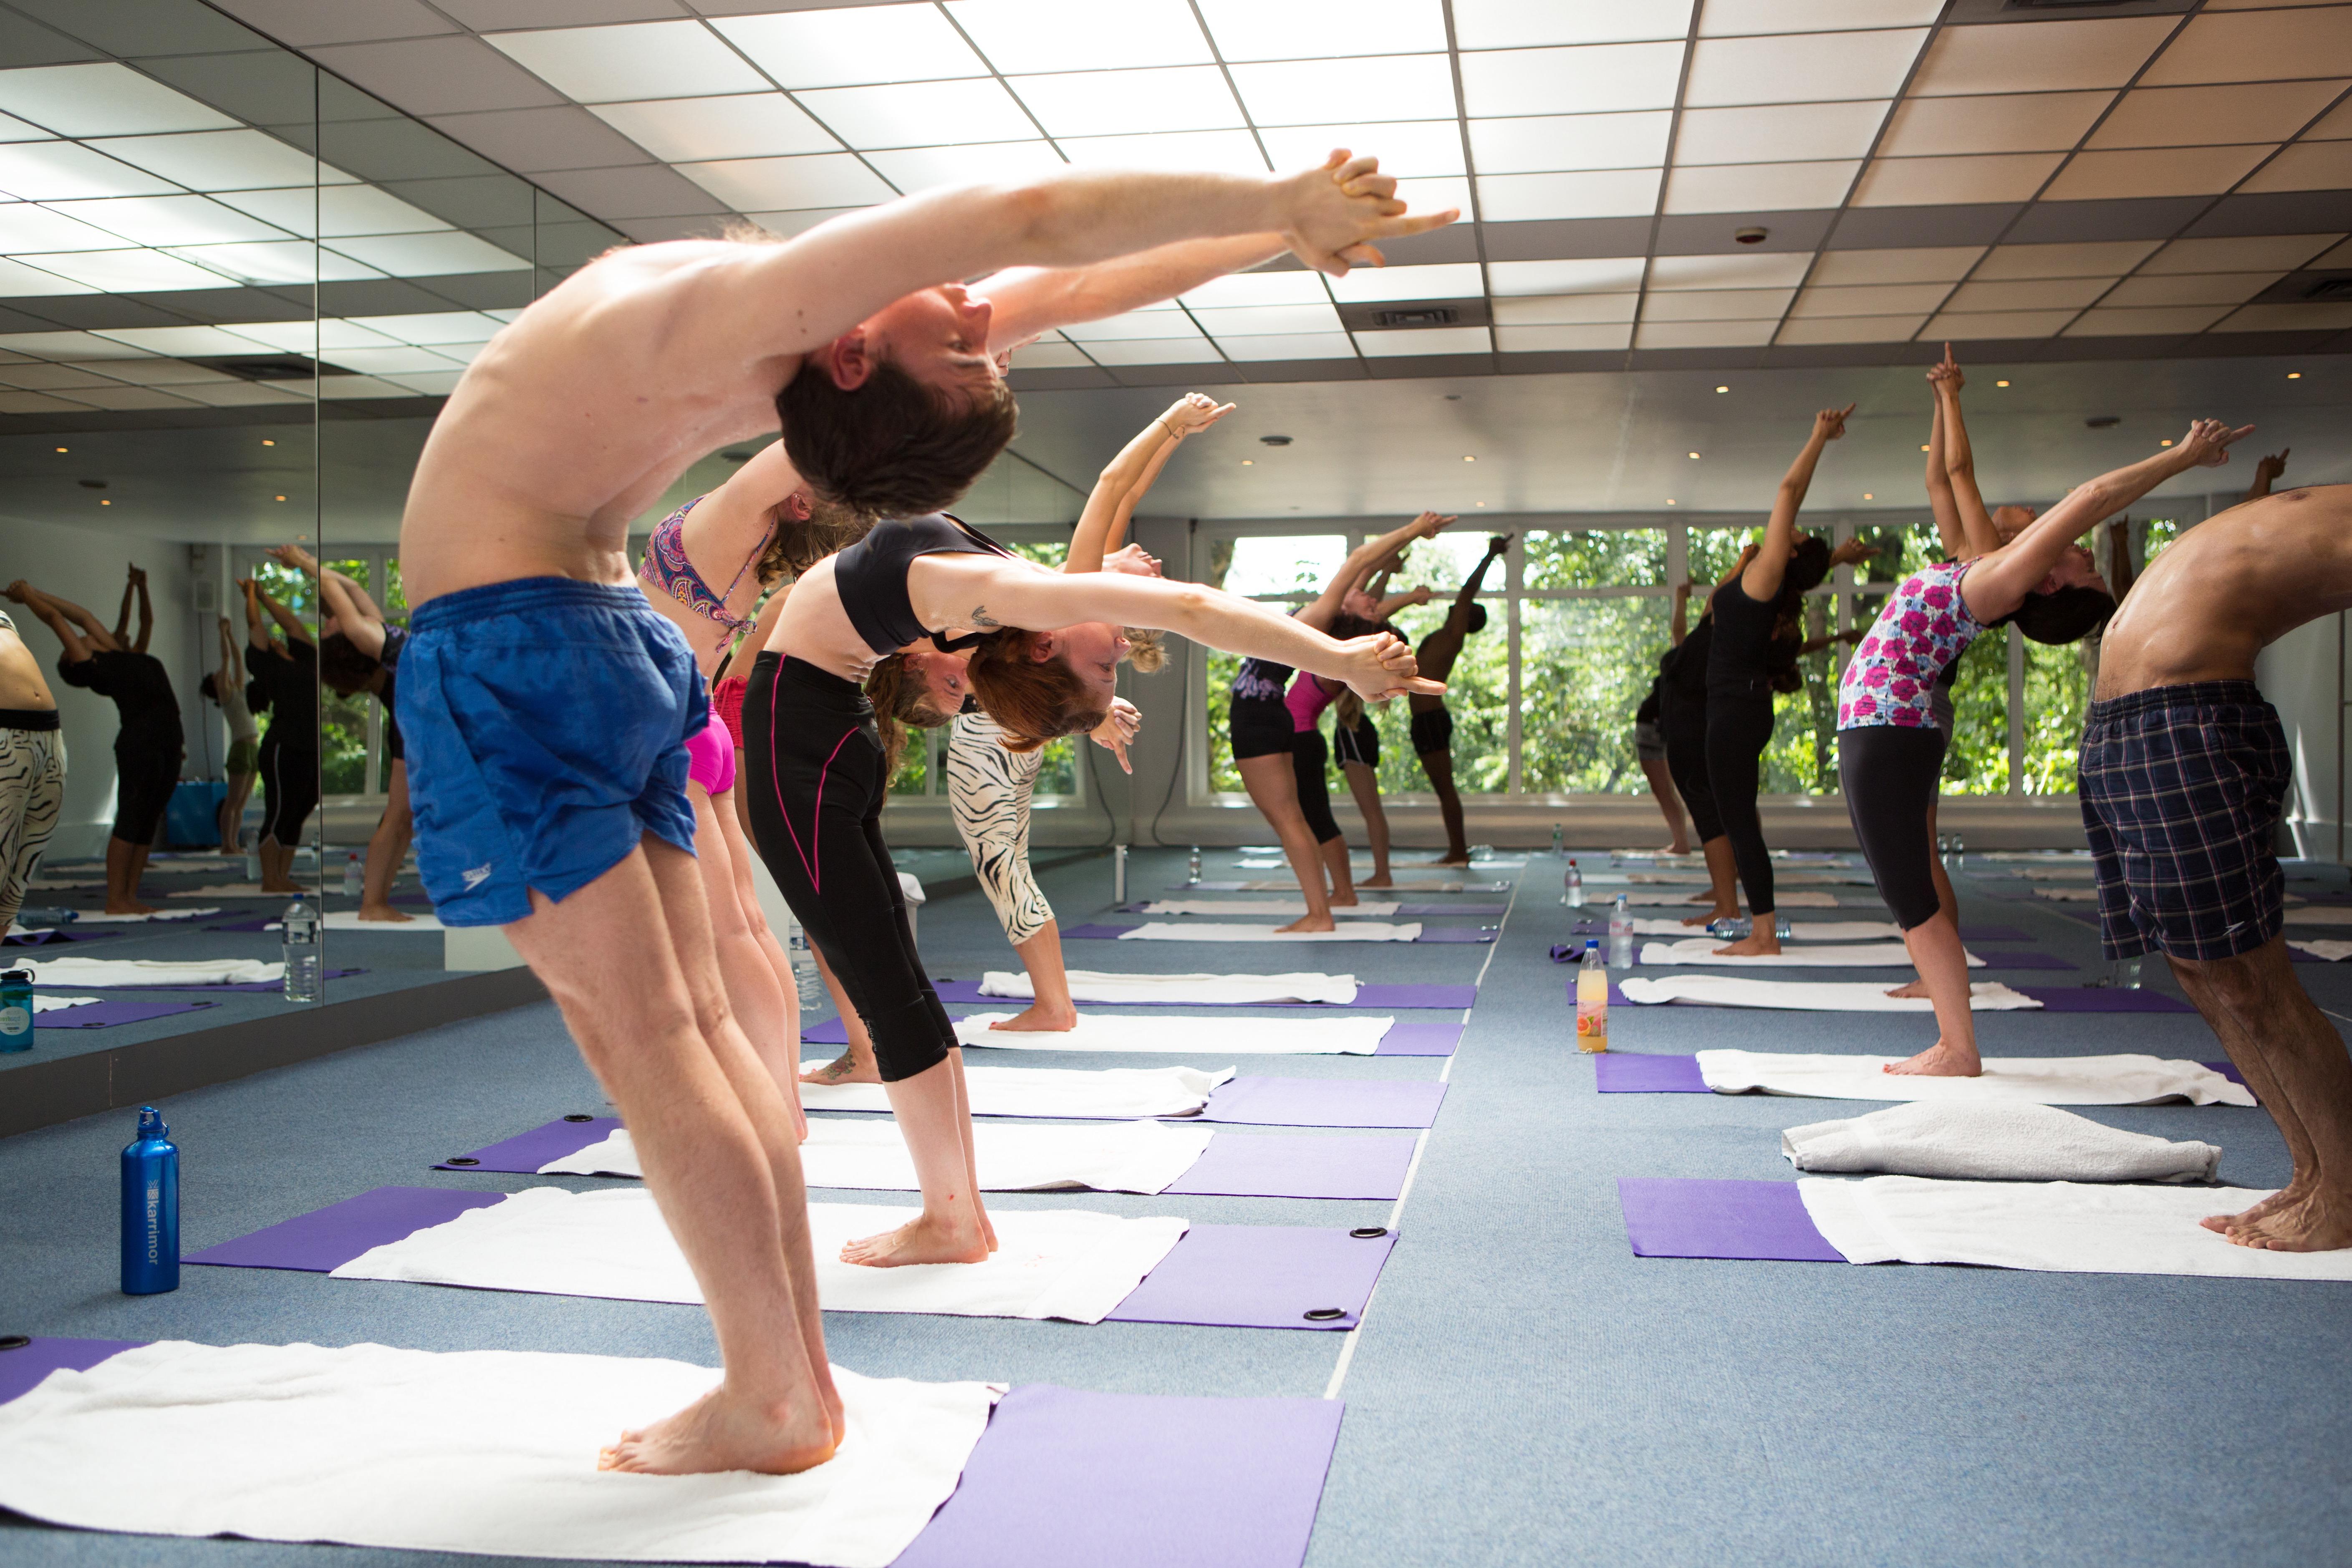 bikram-yoga_17-8-2012_061